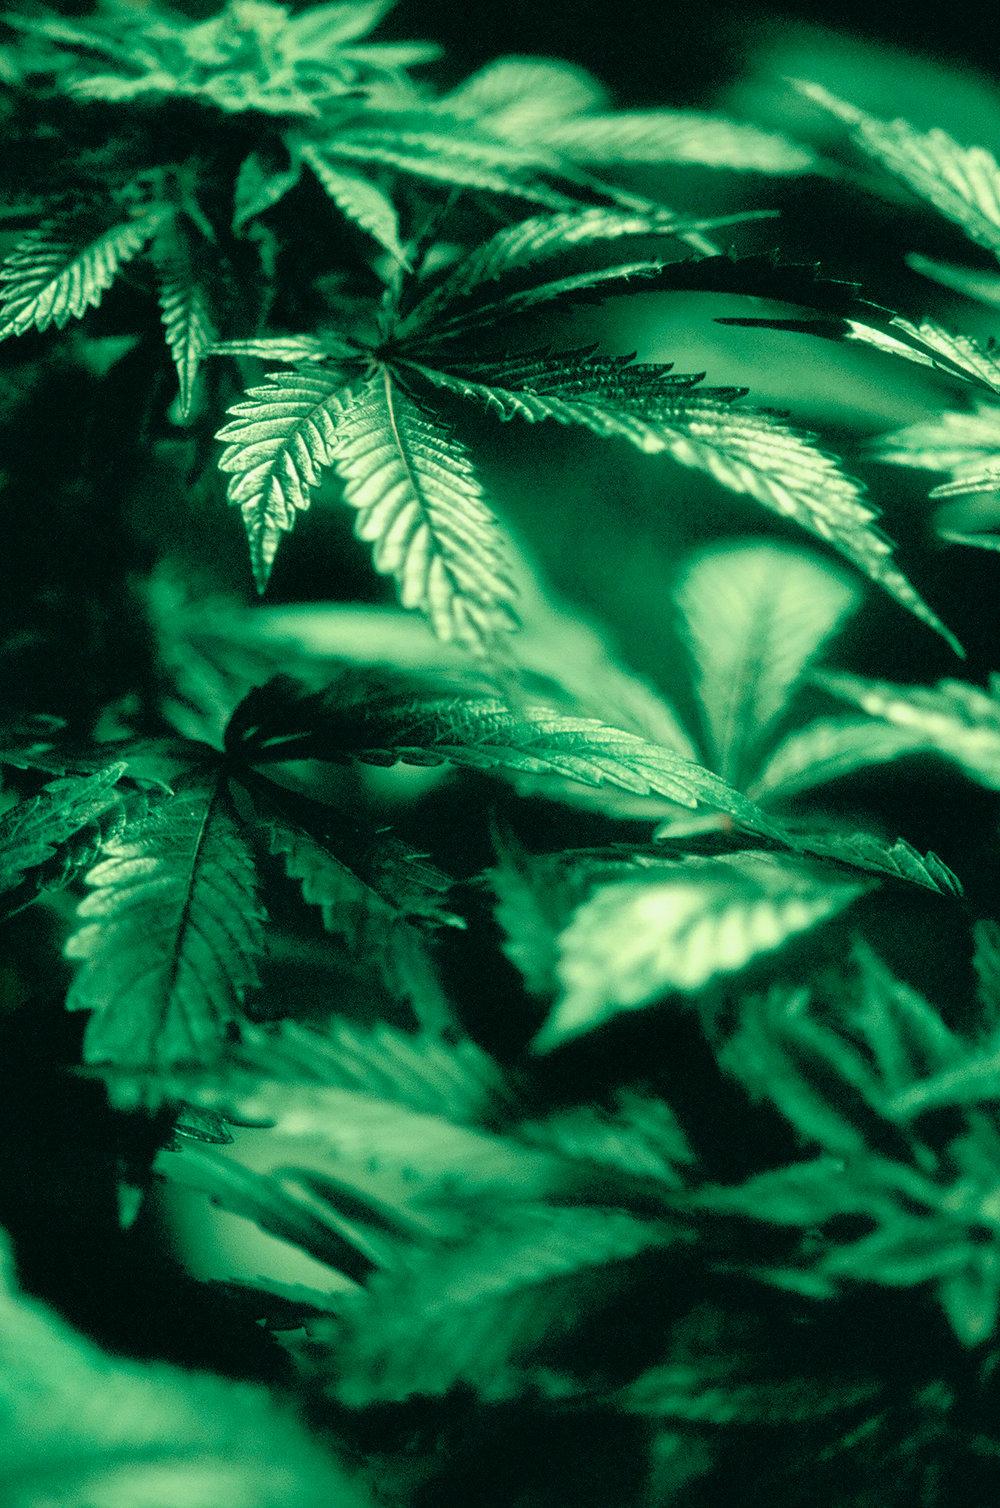 Plants-78630028.jpg